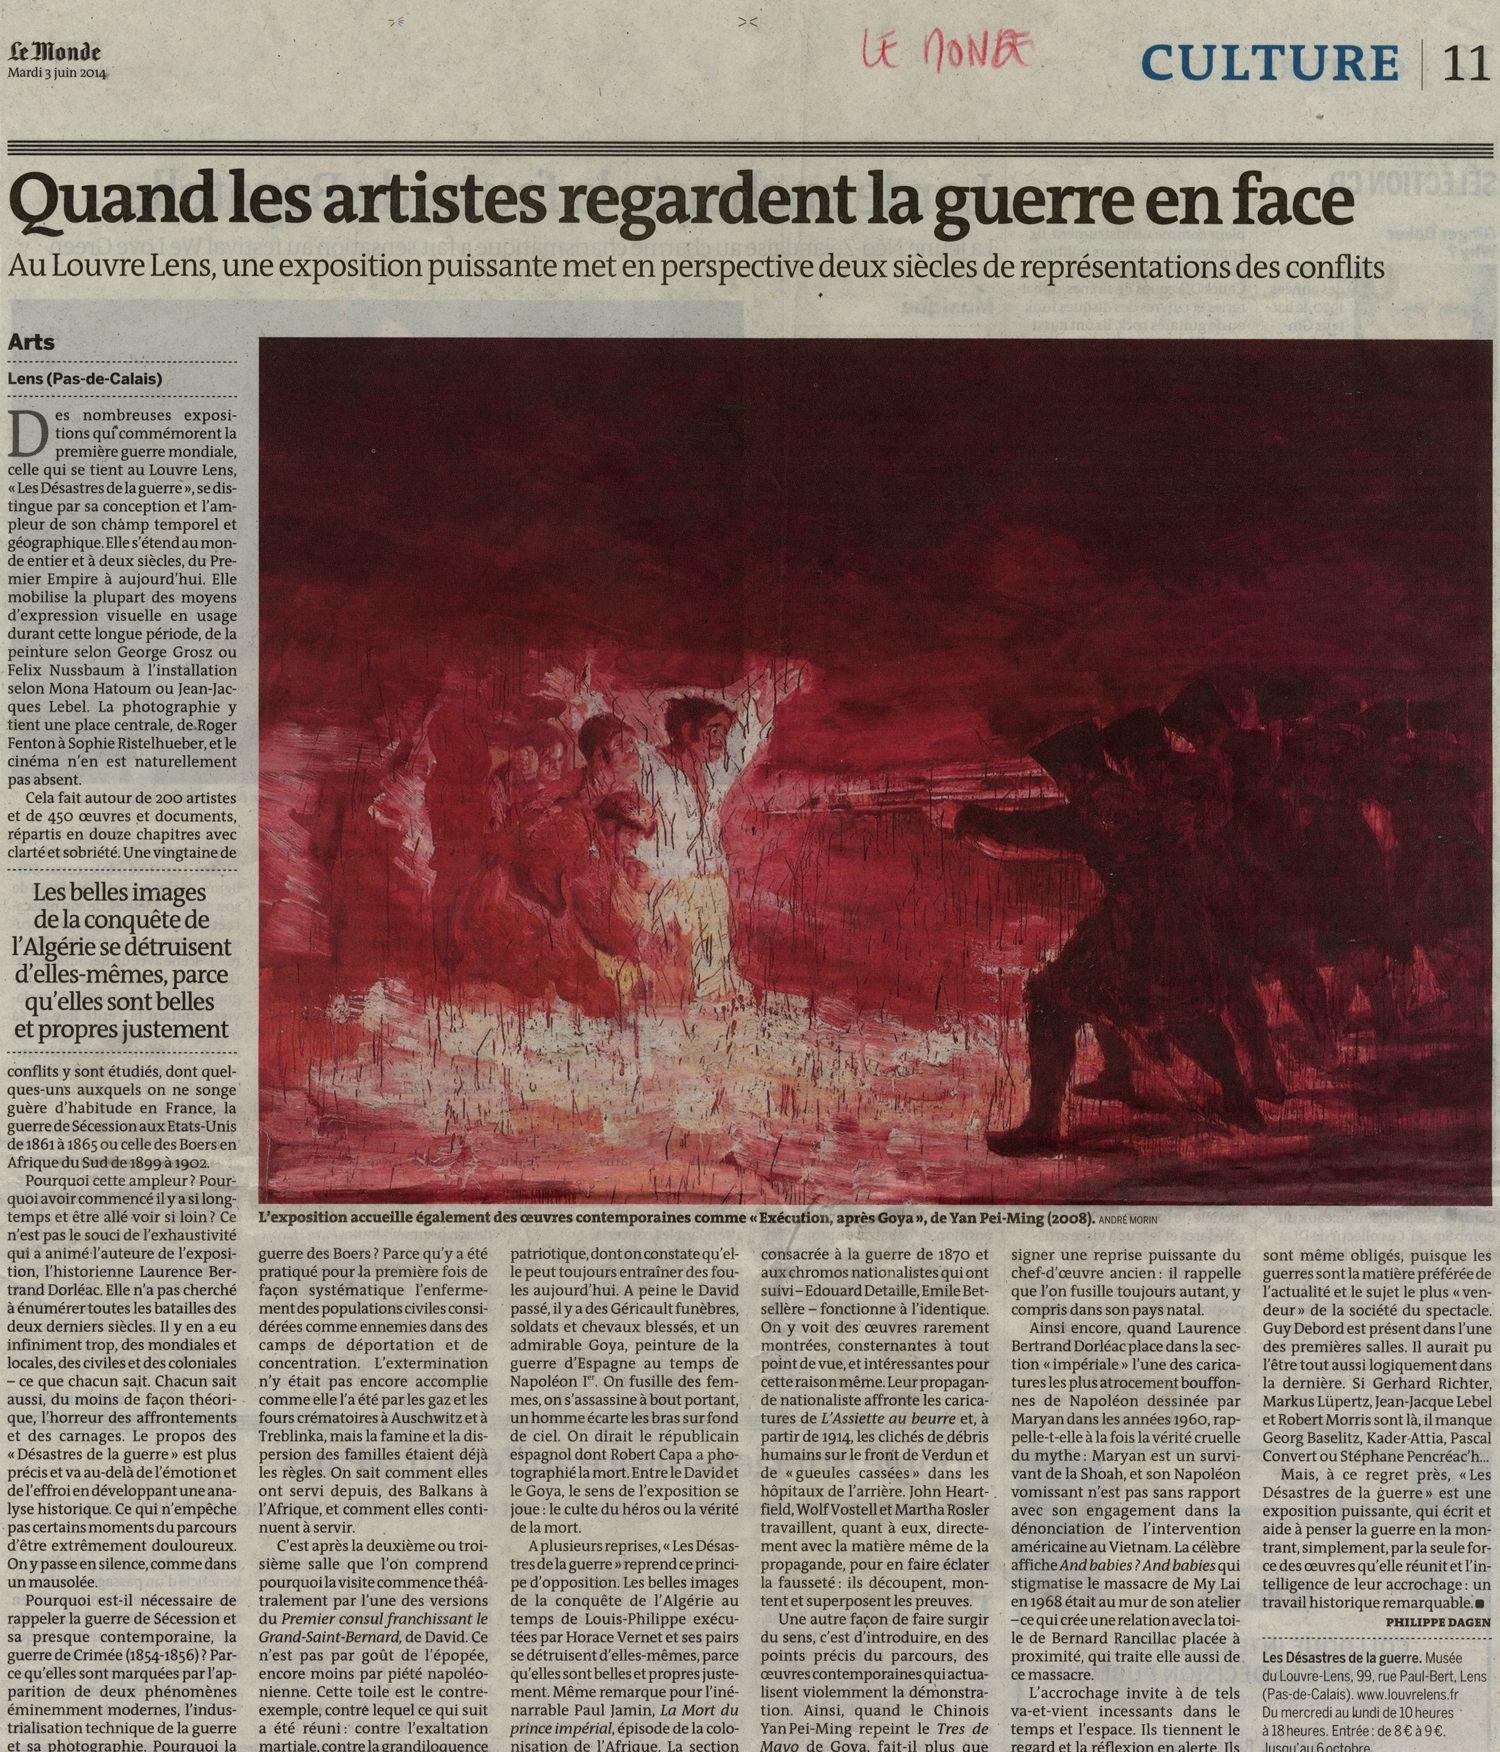 Laurent Greilsamer Michelet Fddacefdacdeef